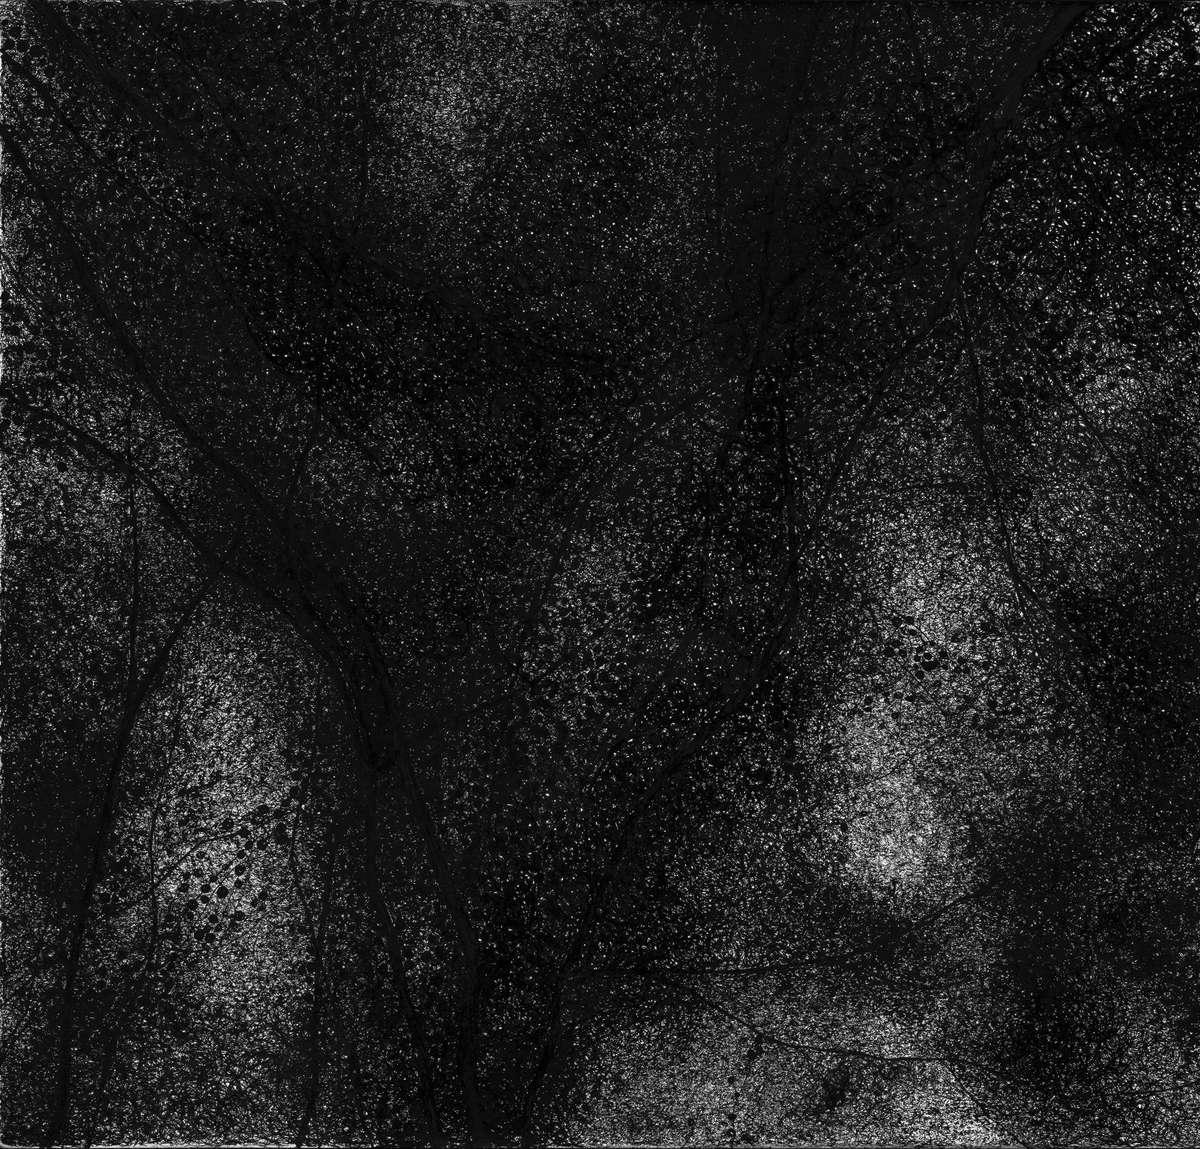 Tina Konec, Dark II